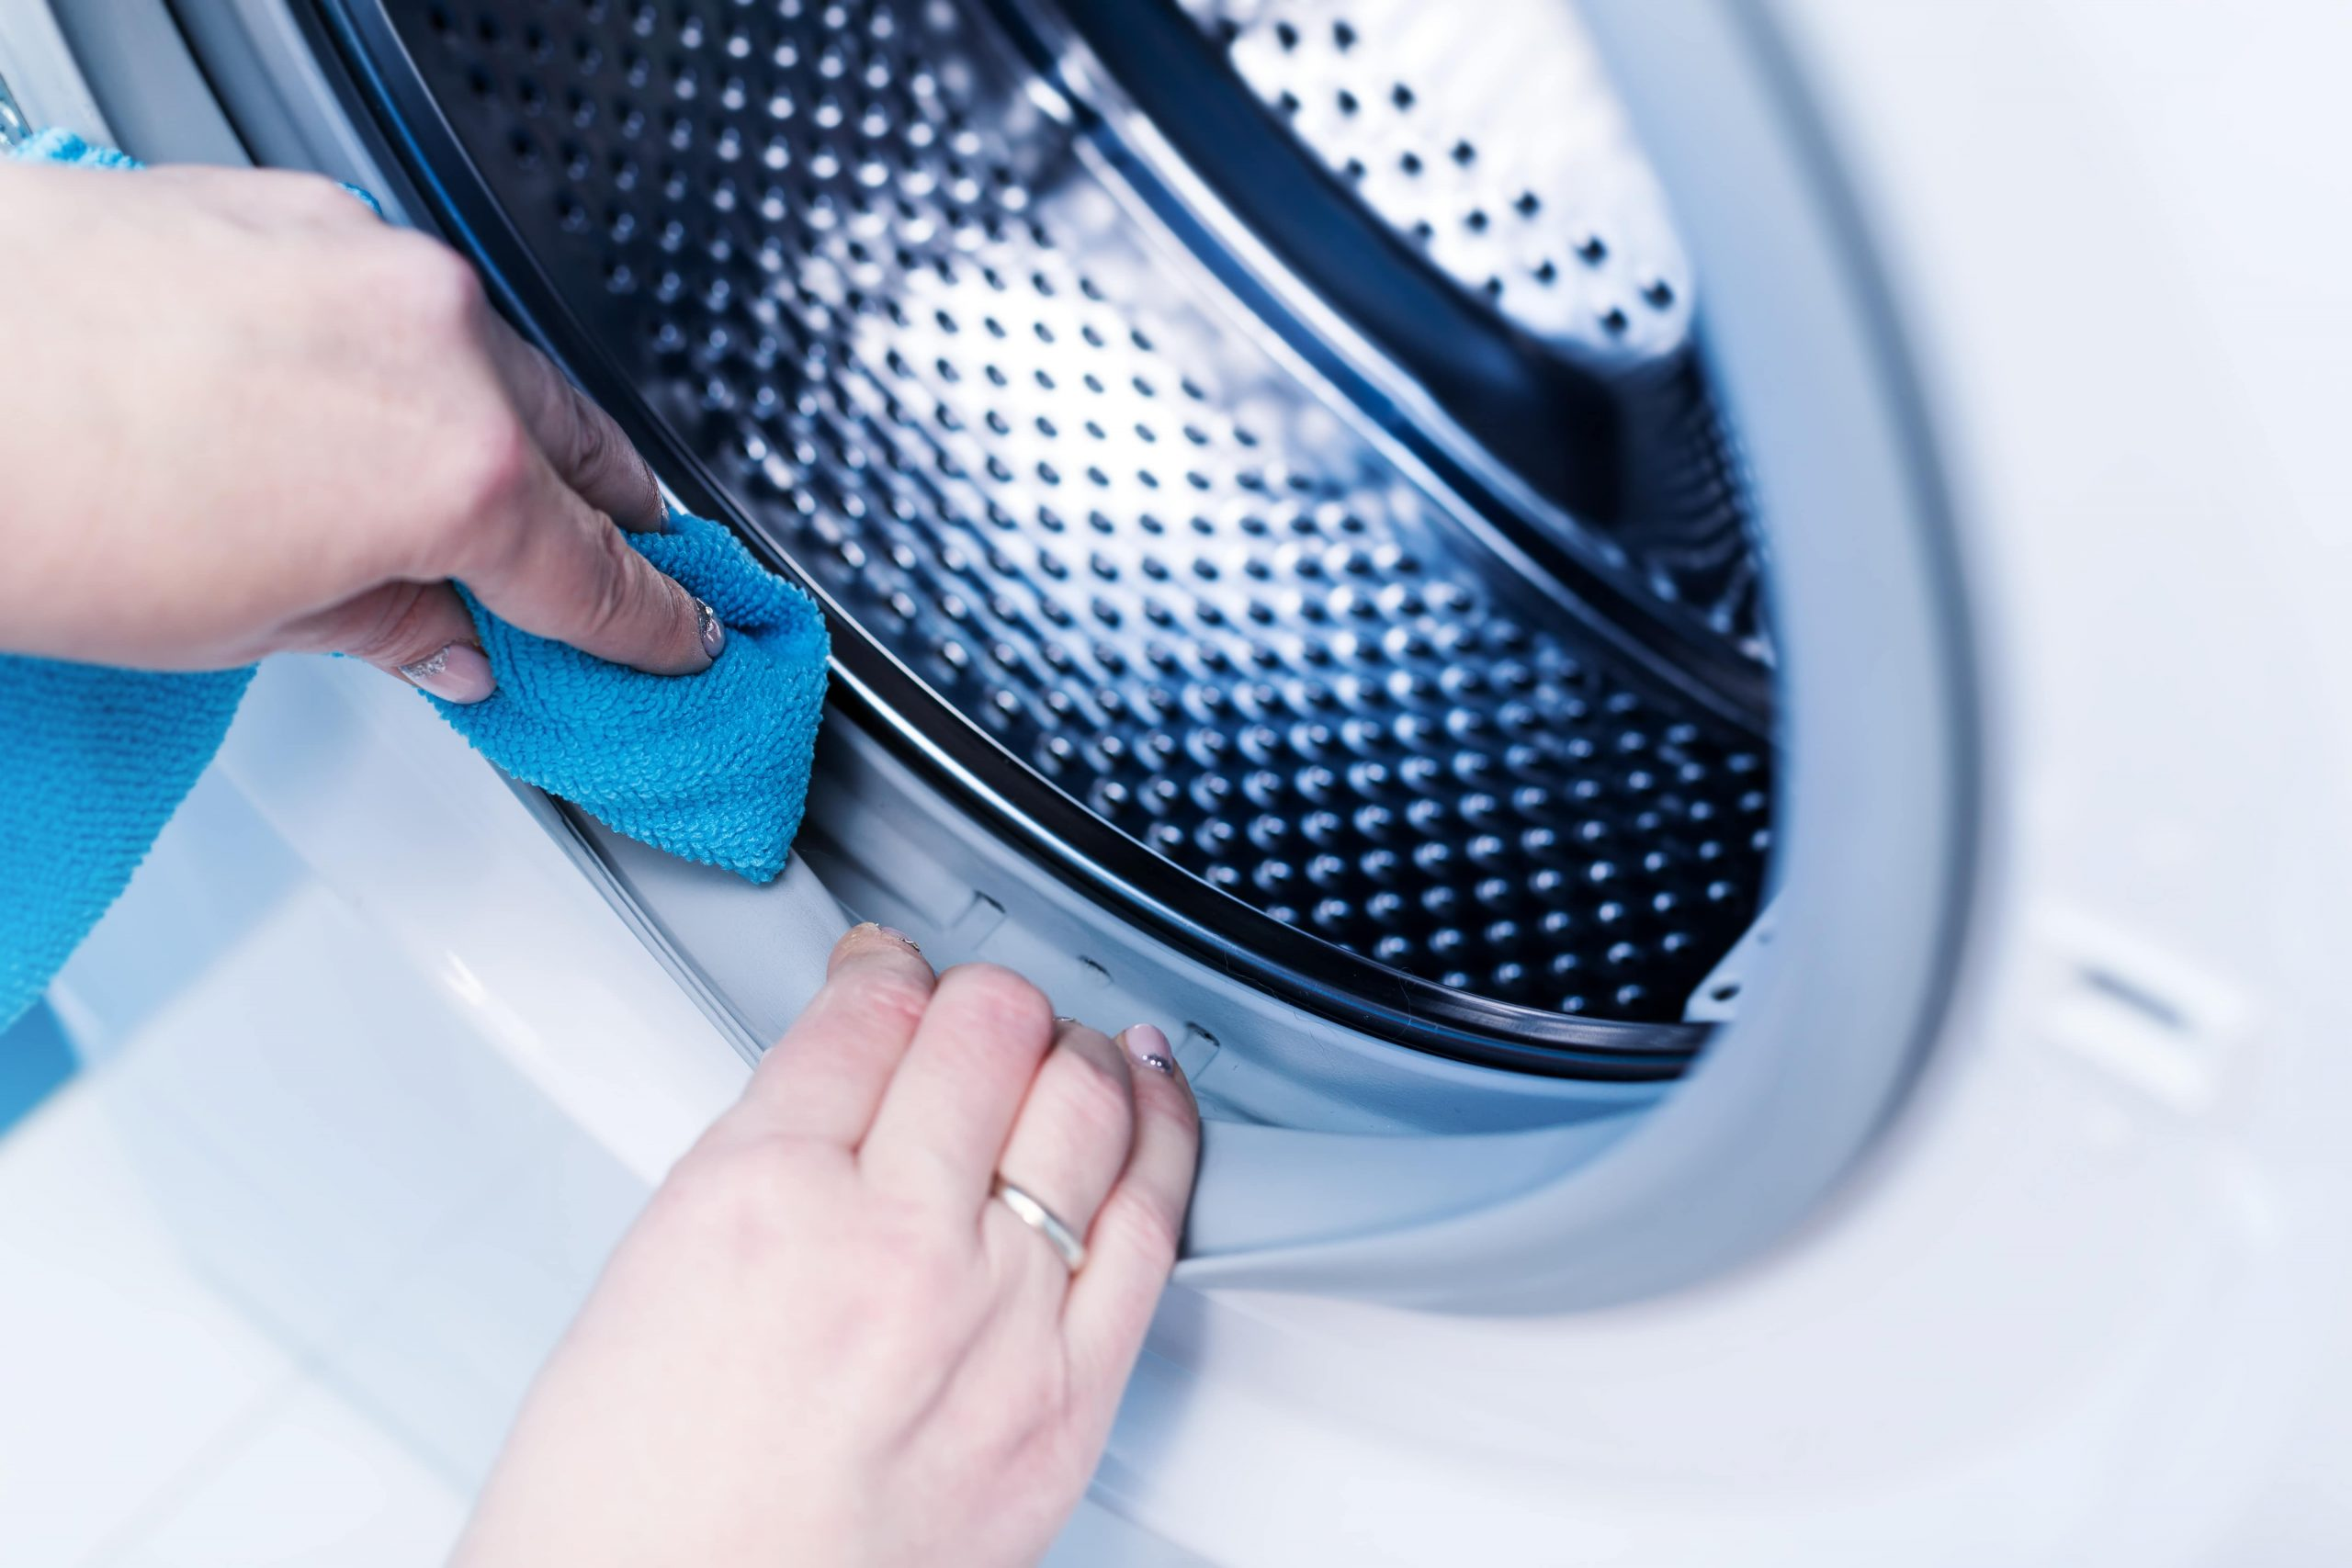 Como limpar a máquina de lavar roupa?